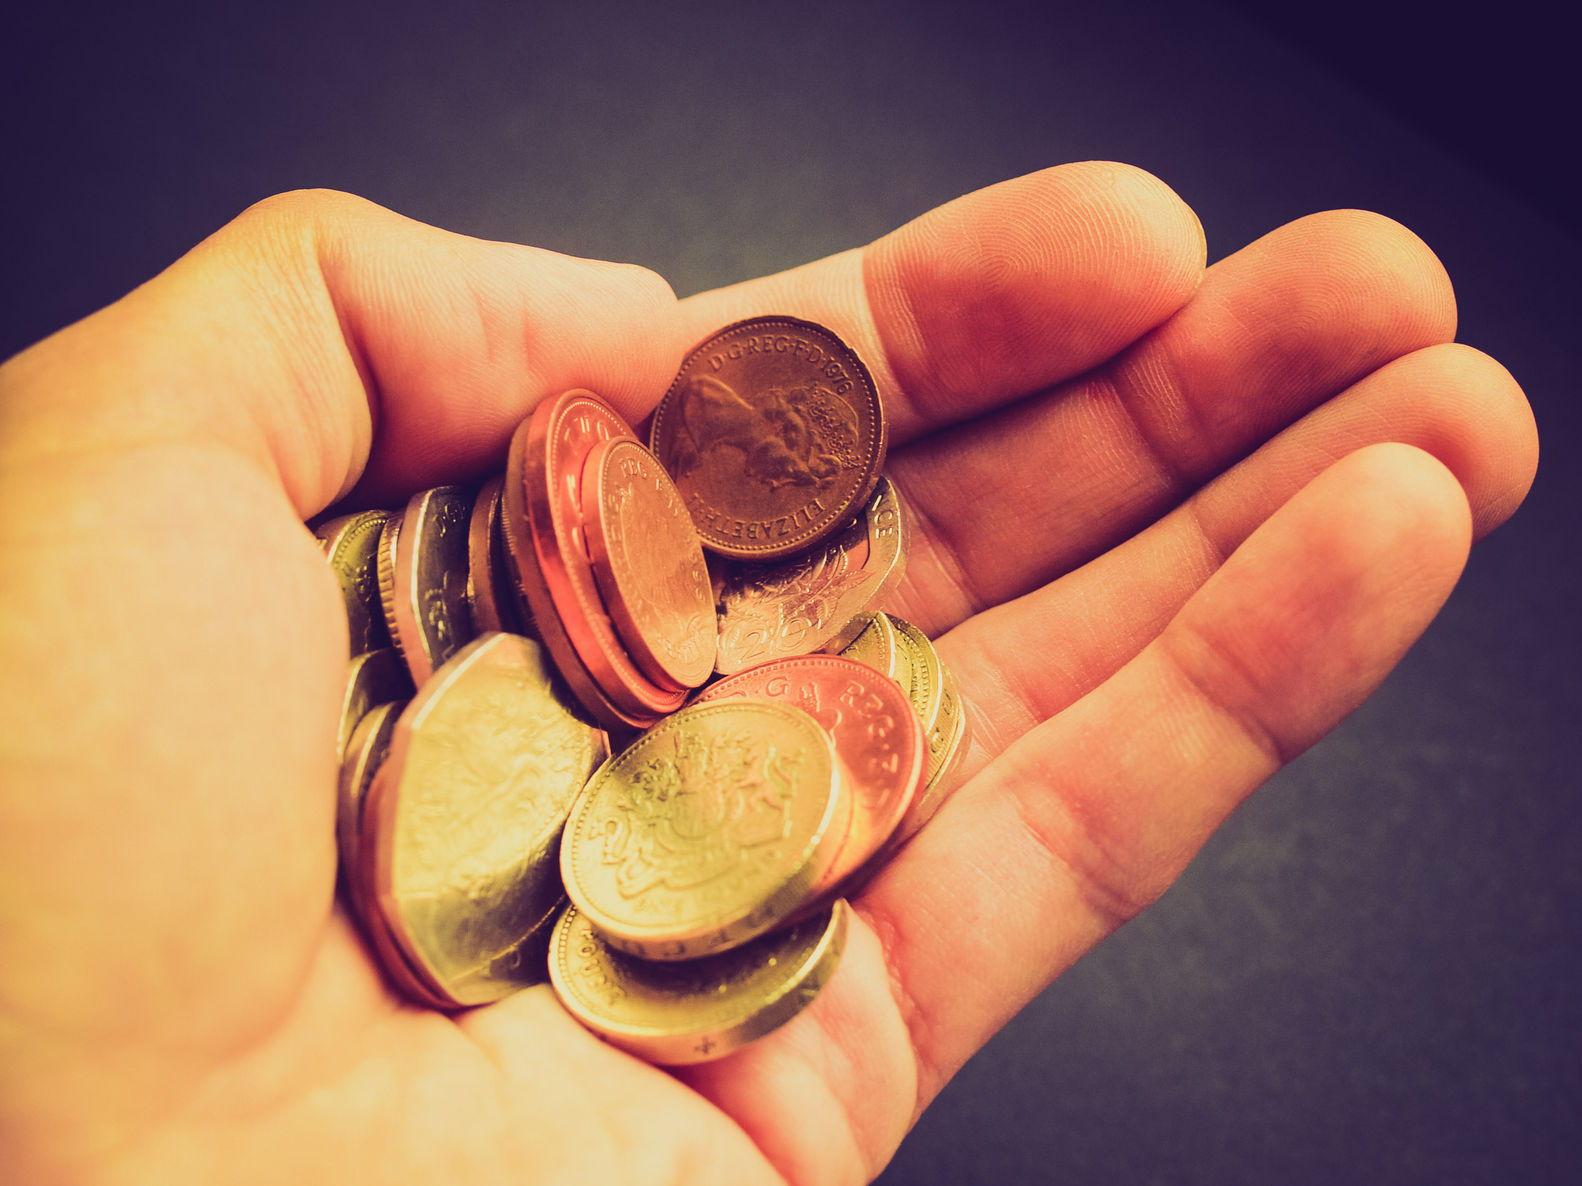 Money addition and making amount of money